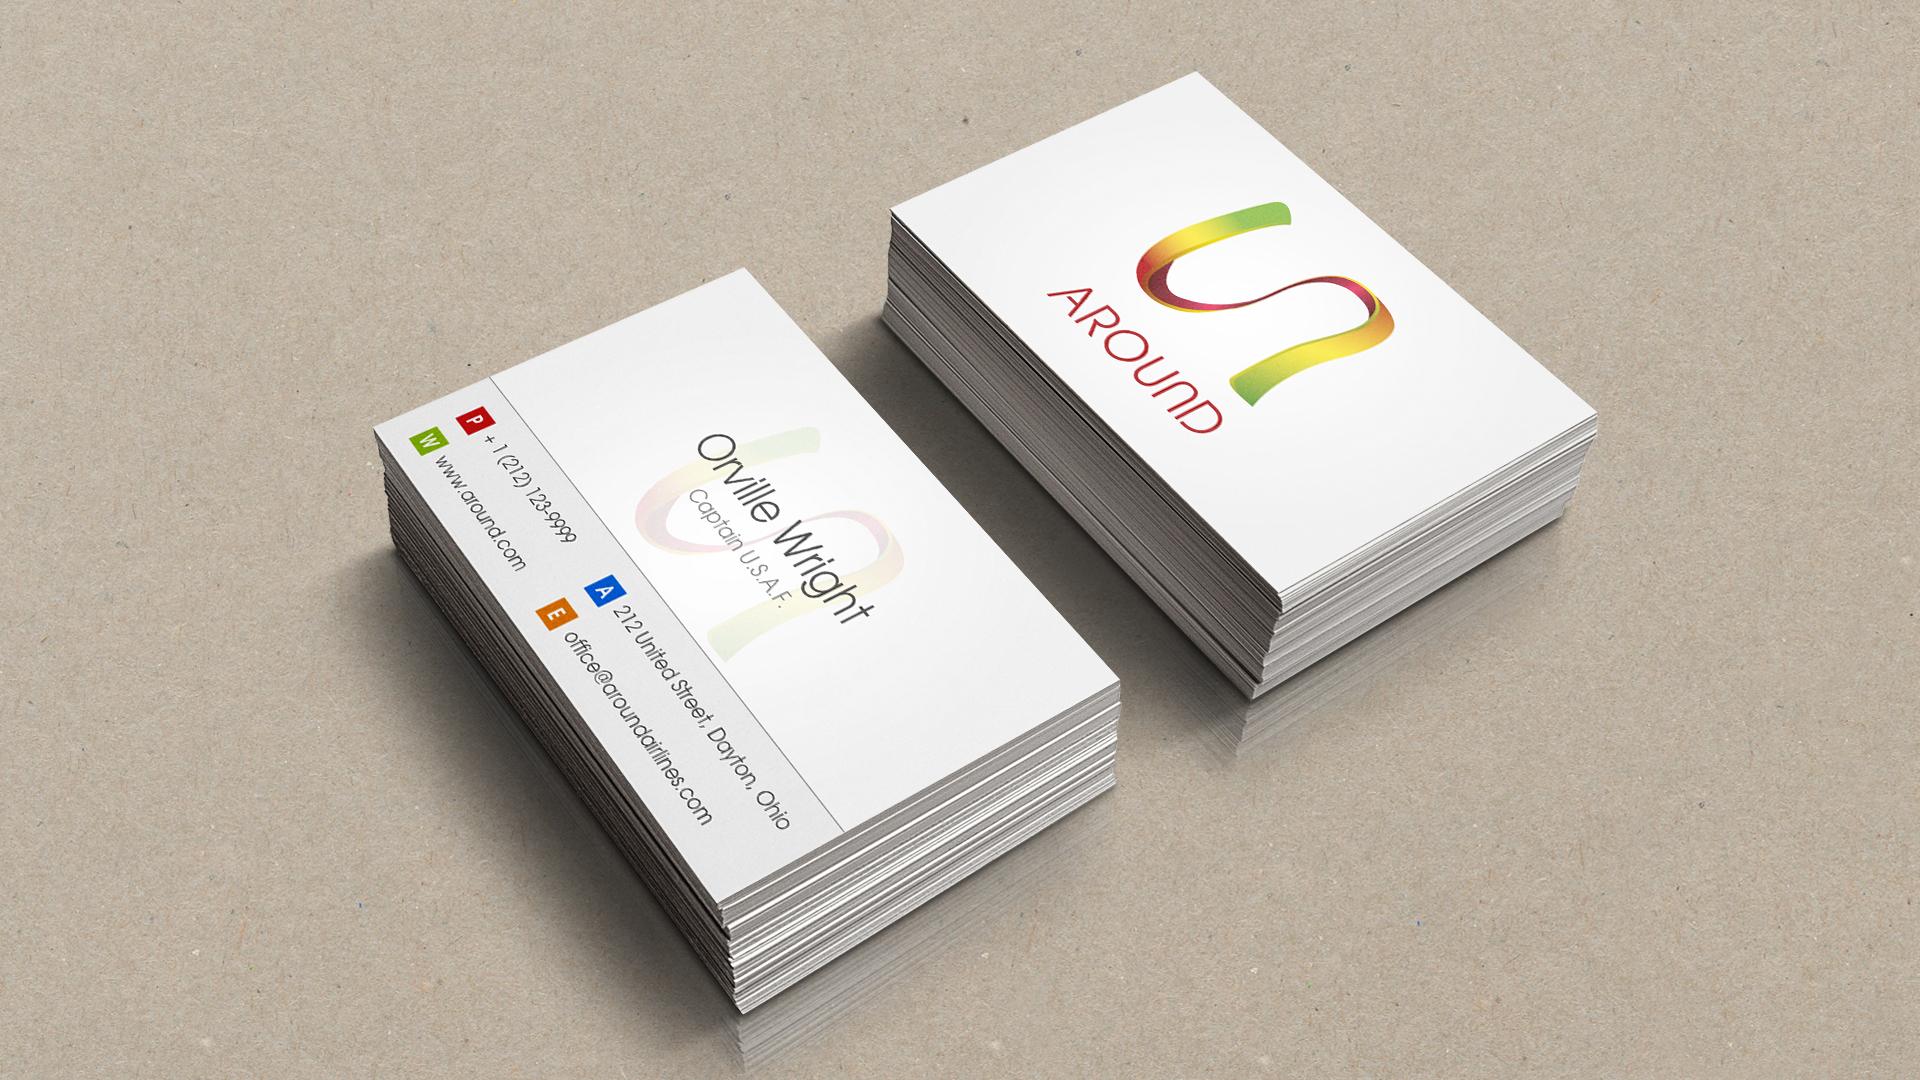 Проекти | BoyanskiDesign